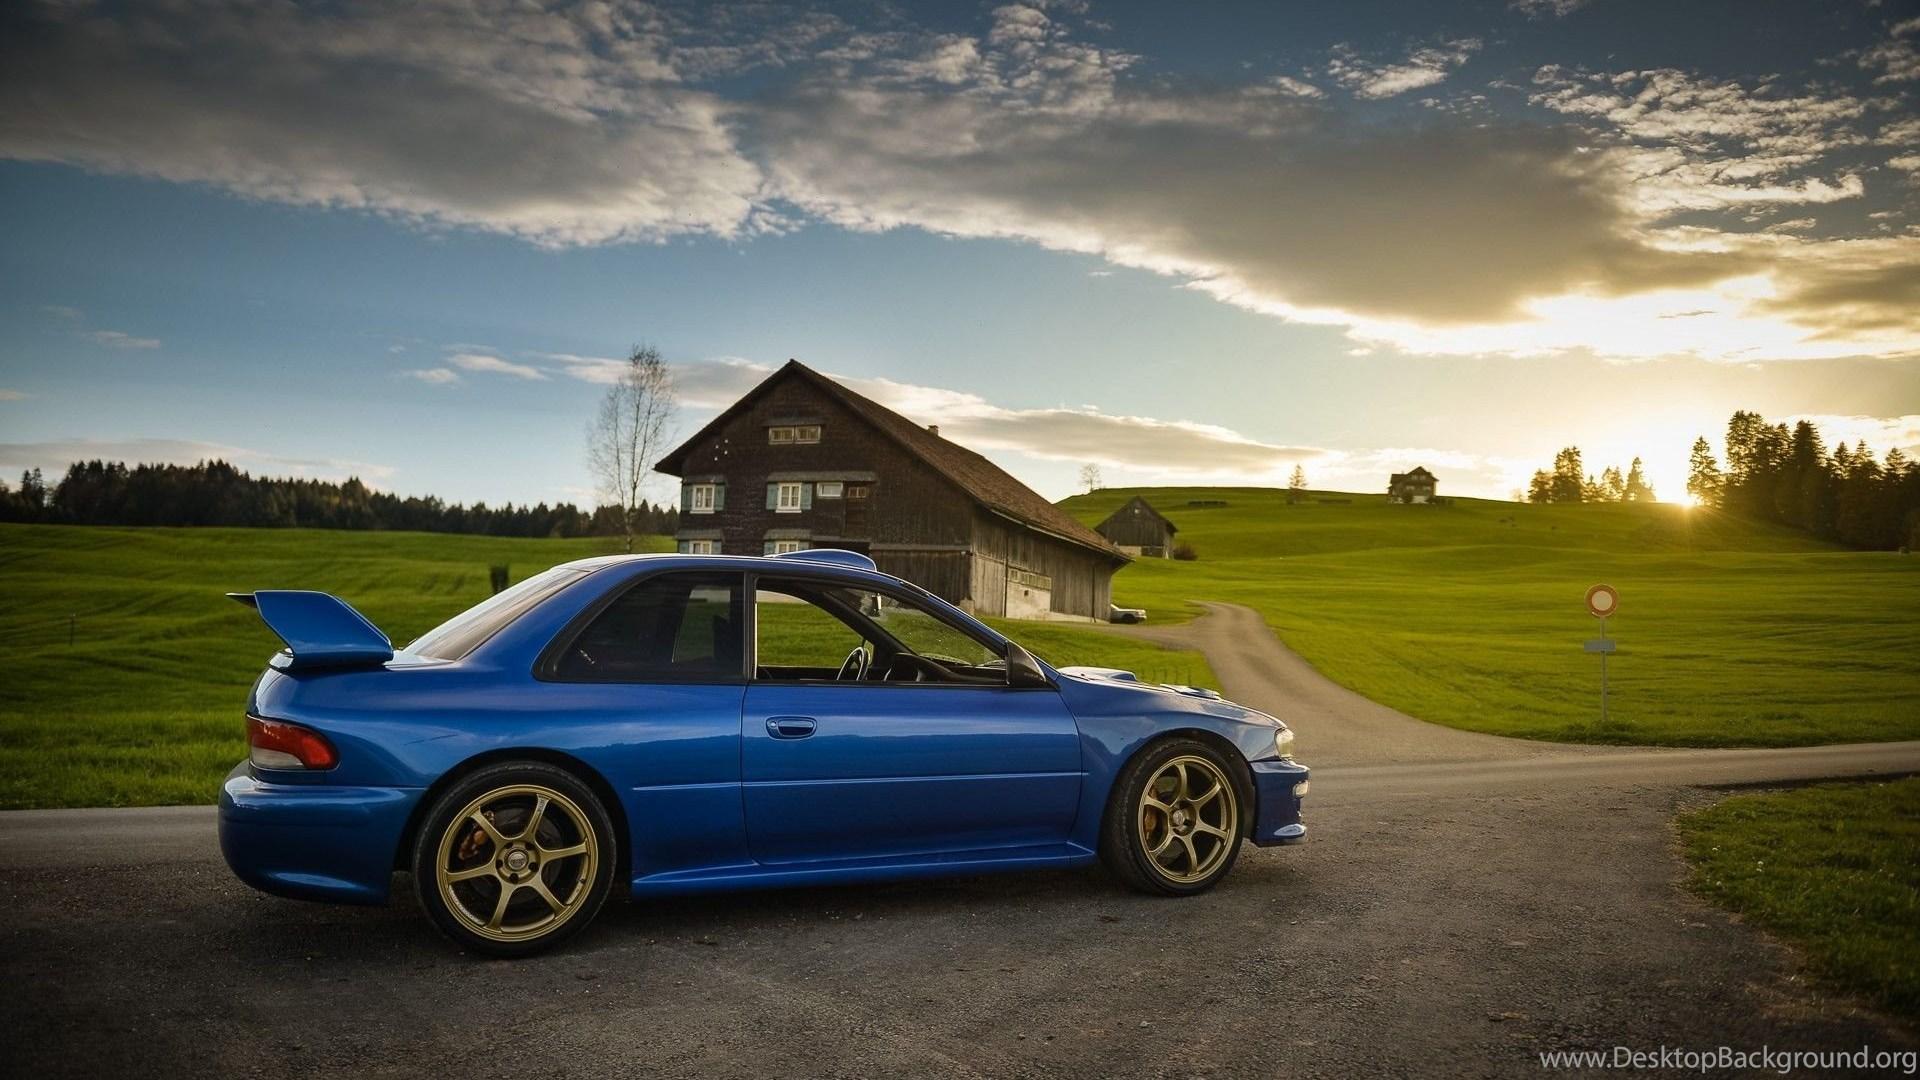 Jdm Speedhunters Subaru Subaru Impreza Wrx Sti Car Tuning